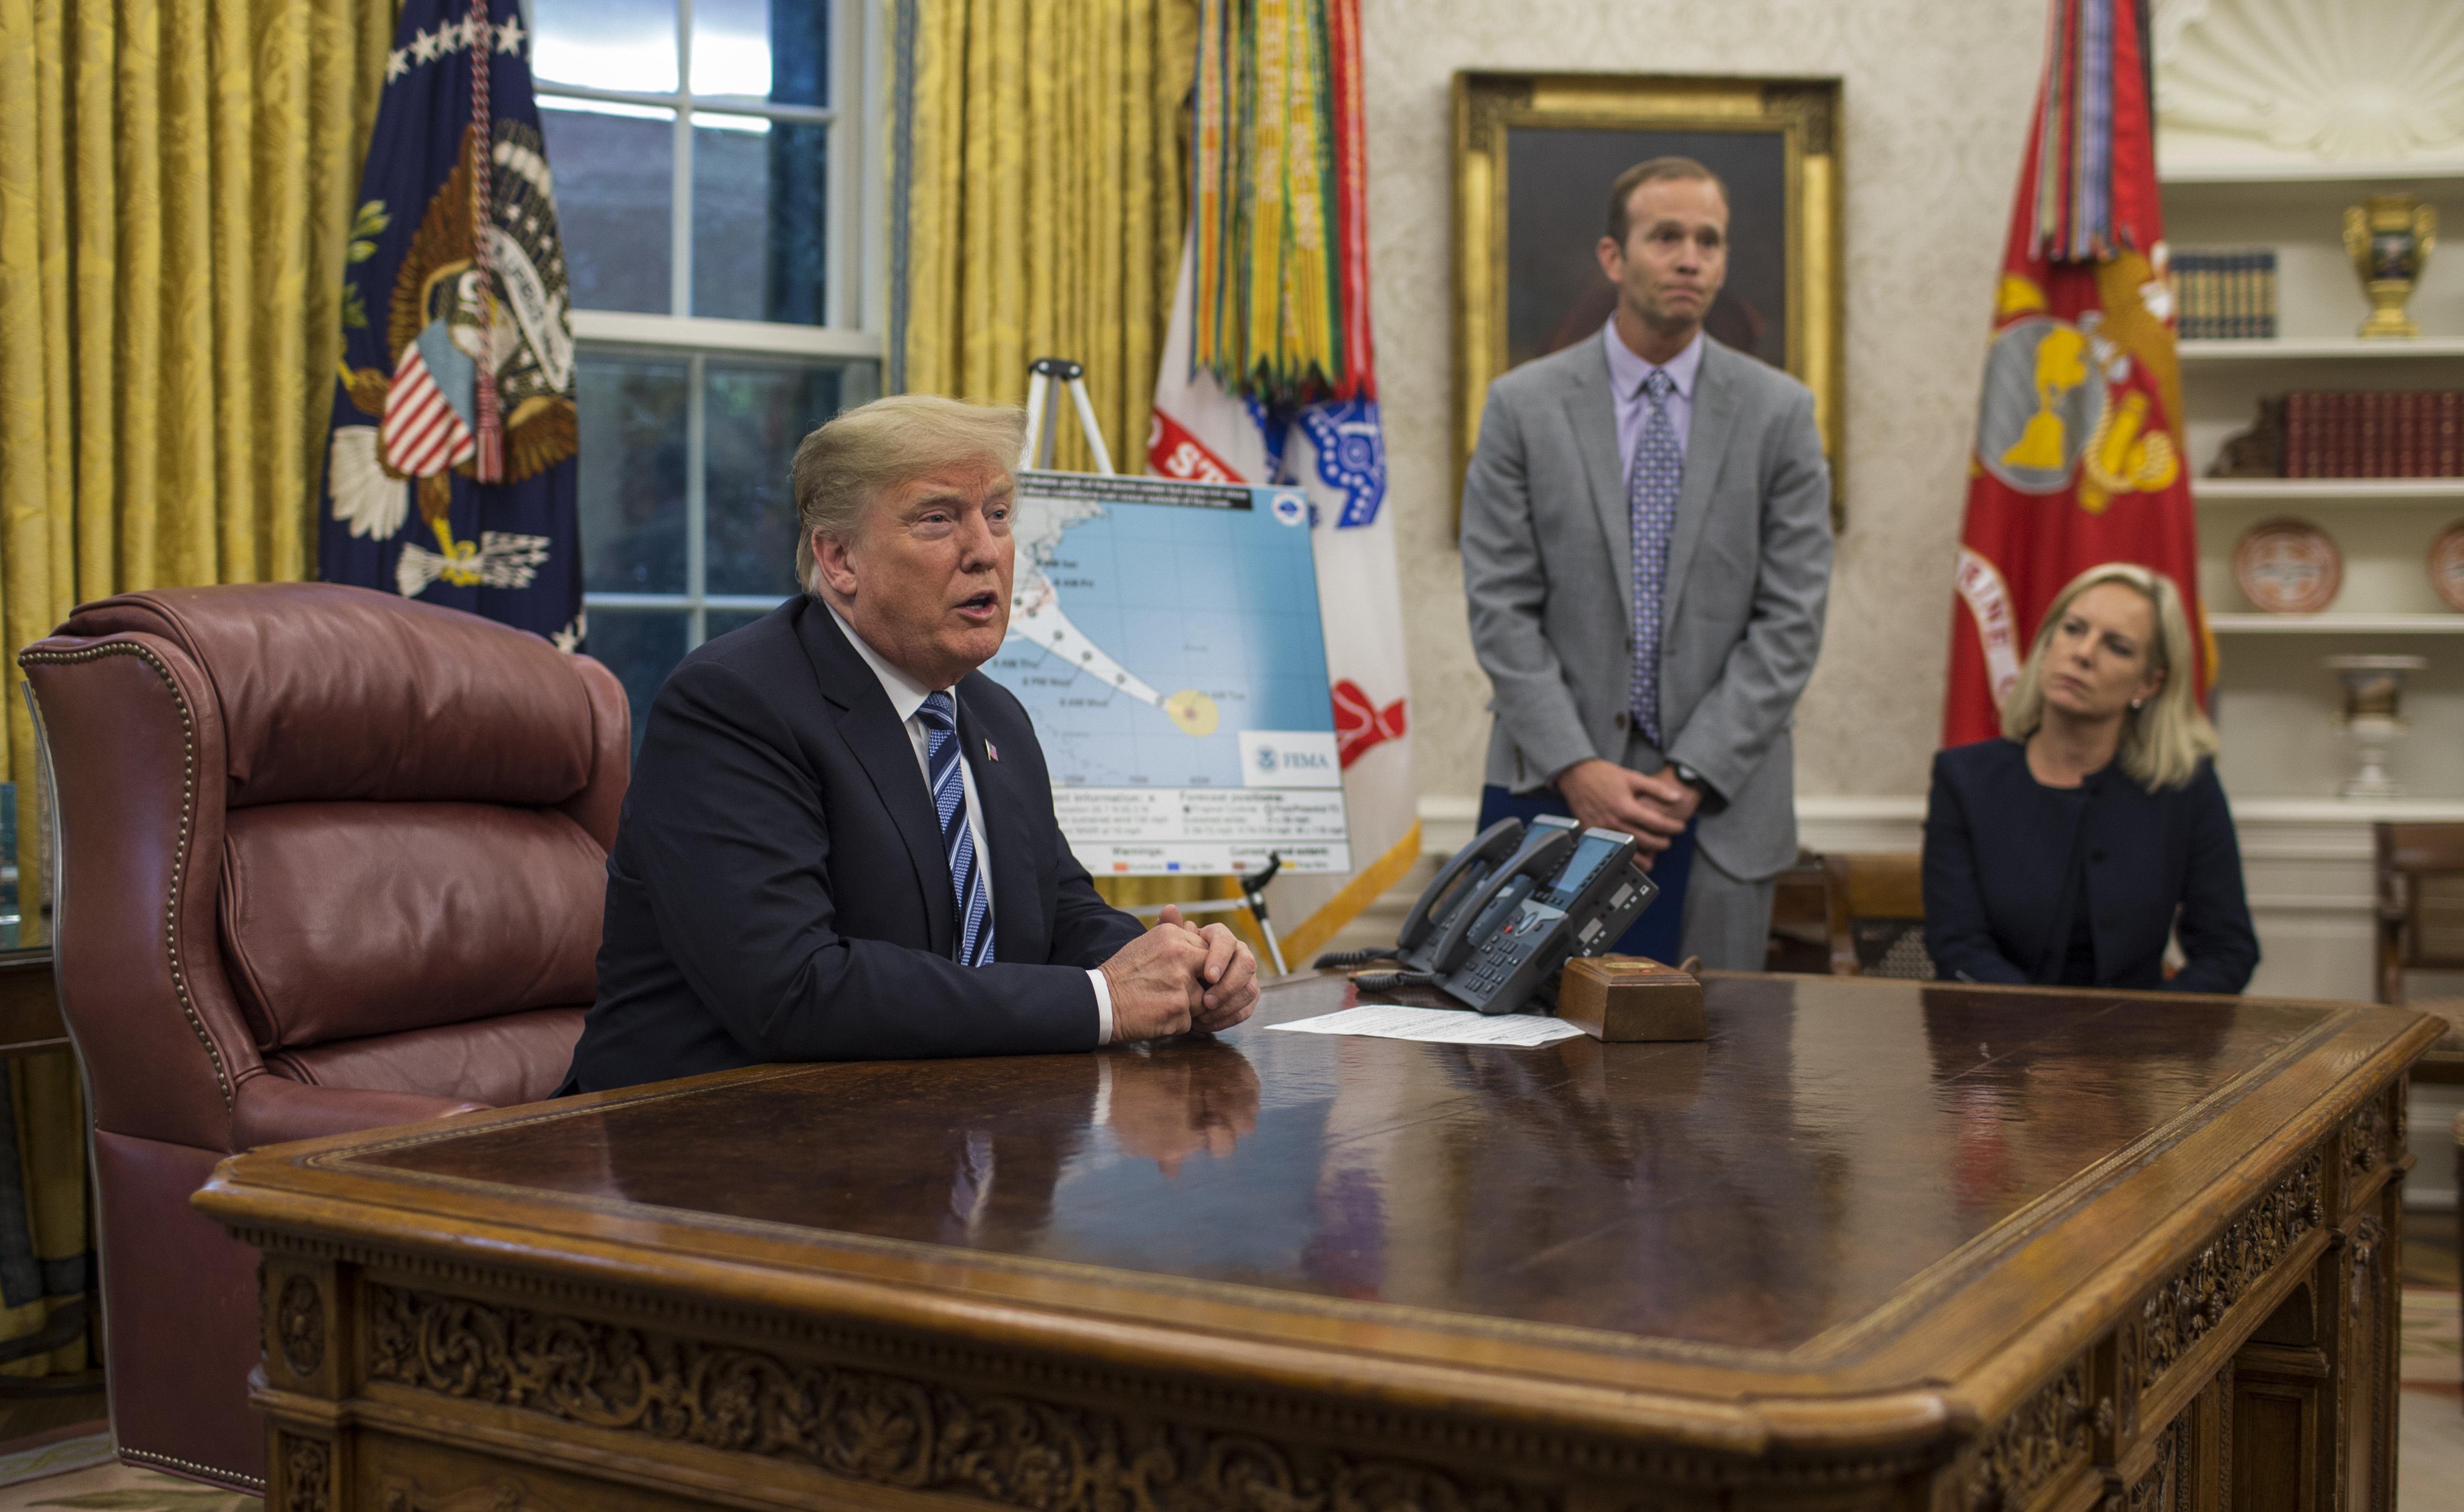 Hurricane Florence To Test FEMA, Trump Administration